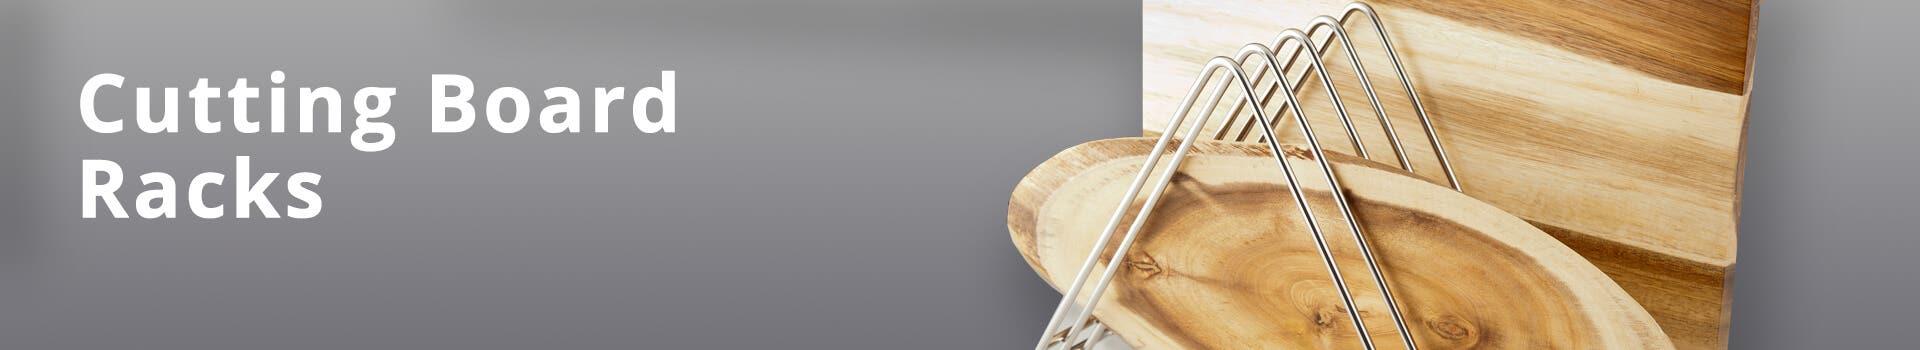 Cutting Board Racks